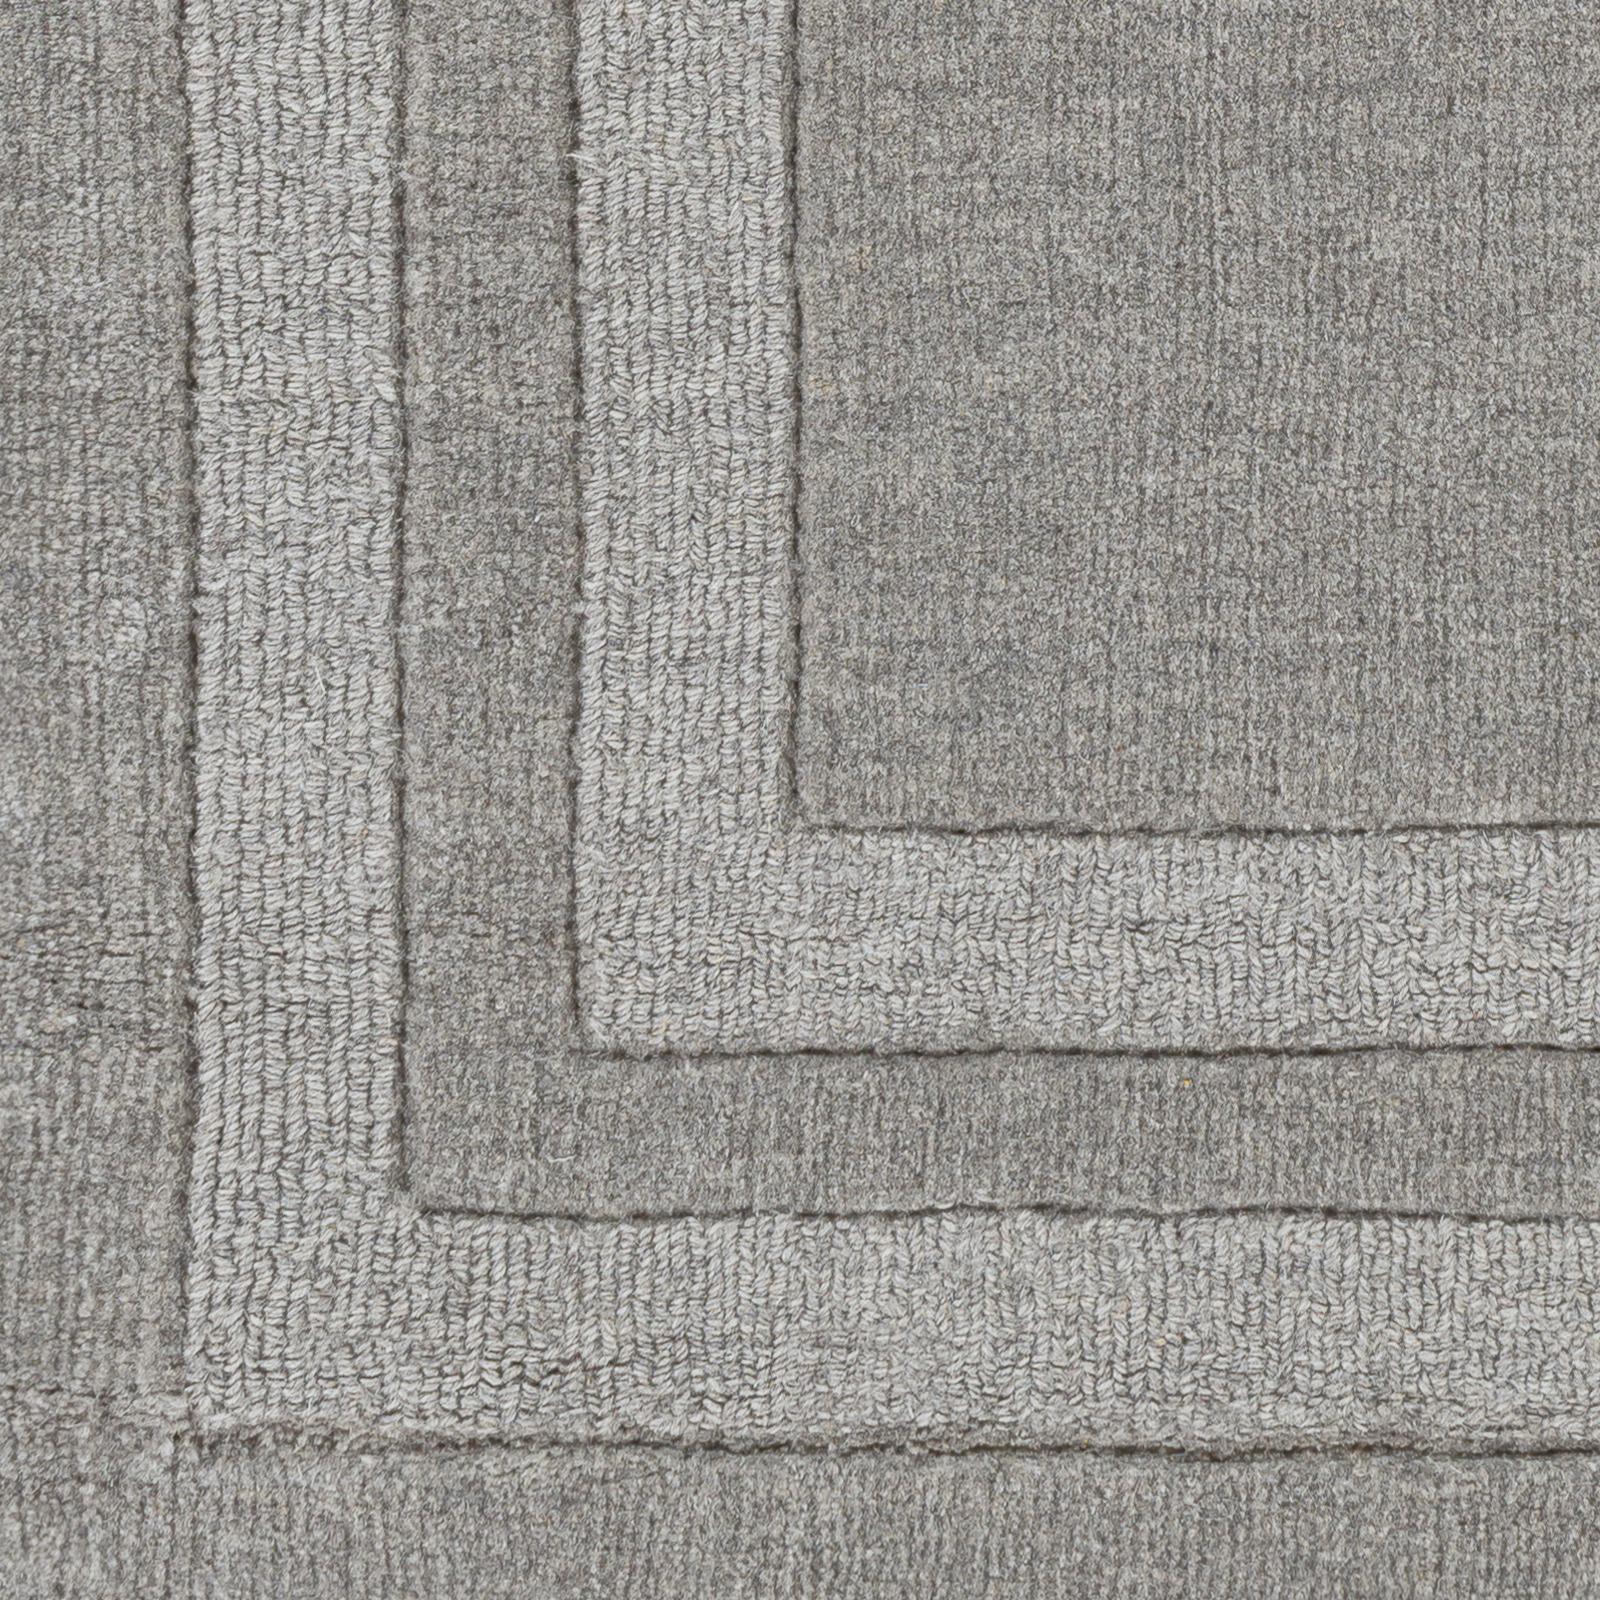 Sorrento - SOT-2303 - 2' x 3'